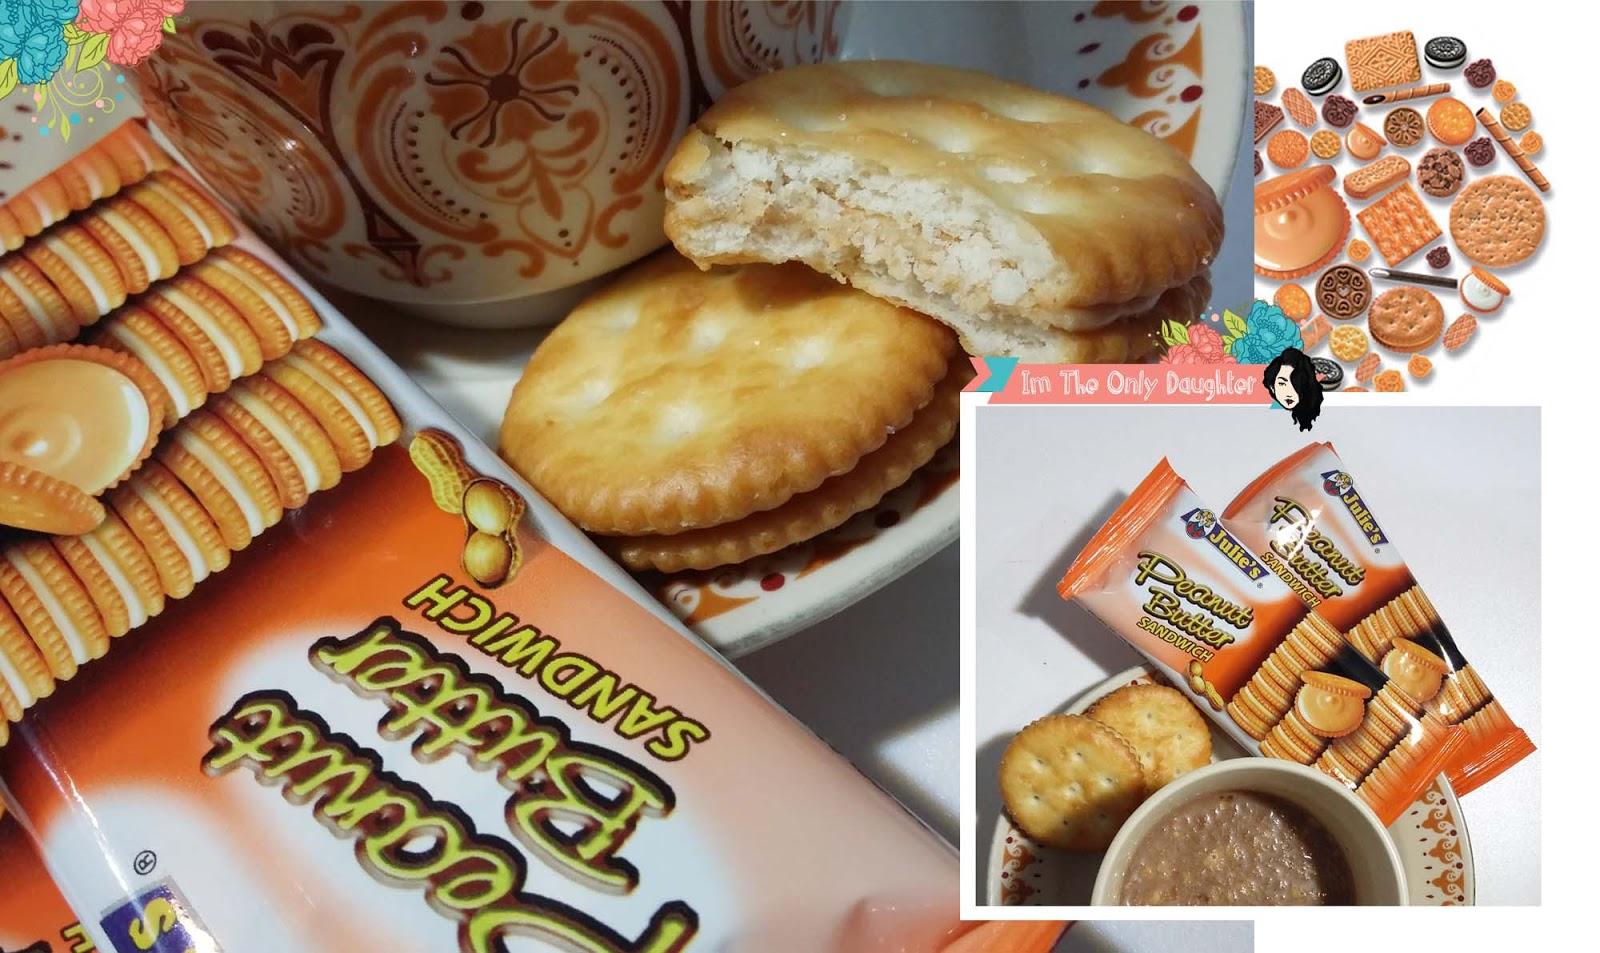 Im Addicted To Julies Biscuit Ahhhh Ini ENAKKK